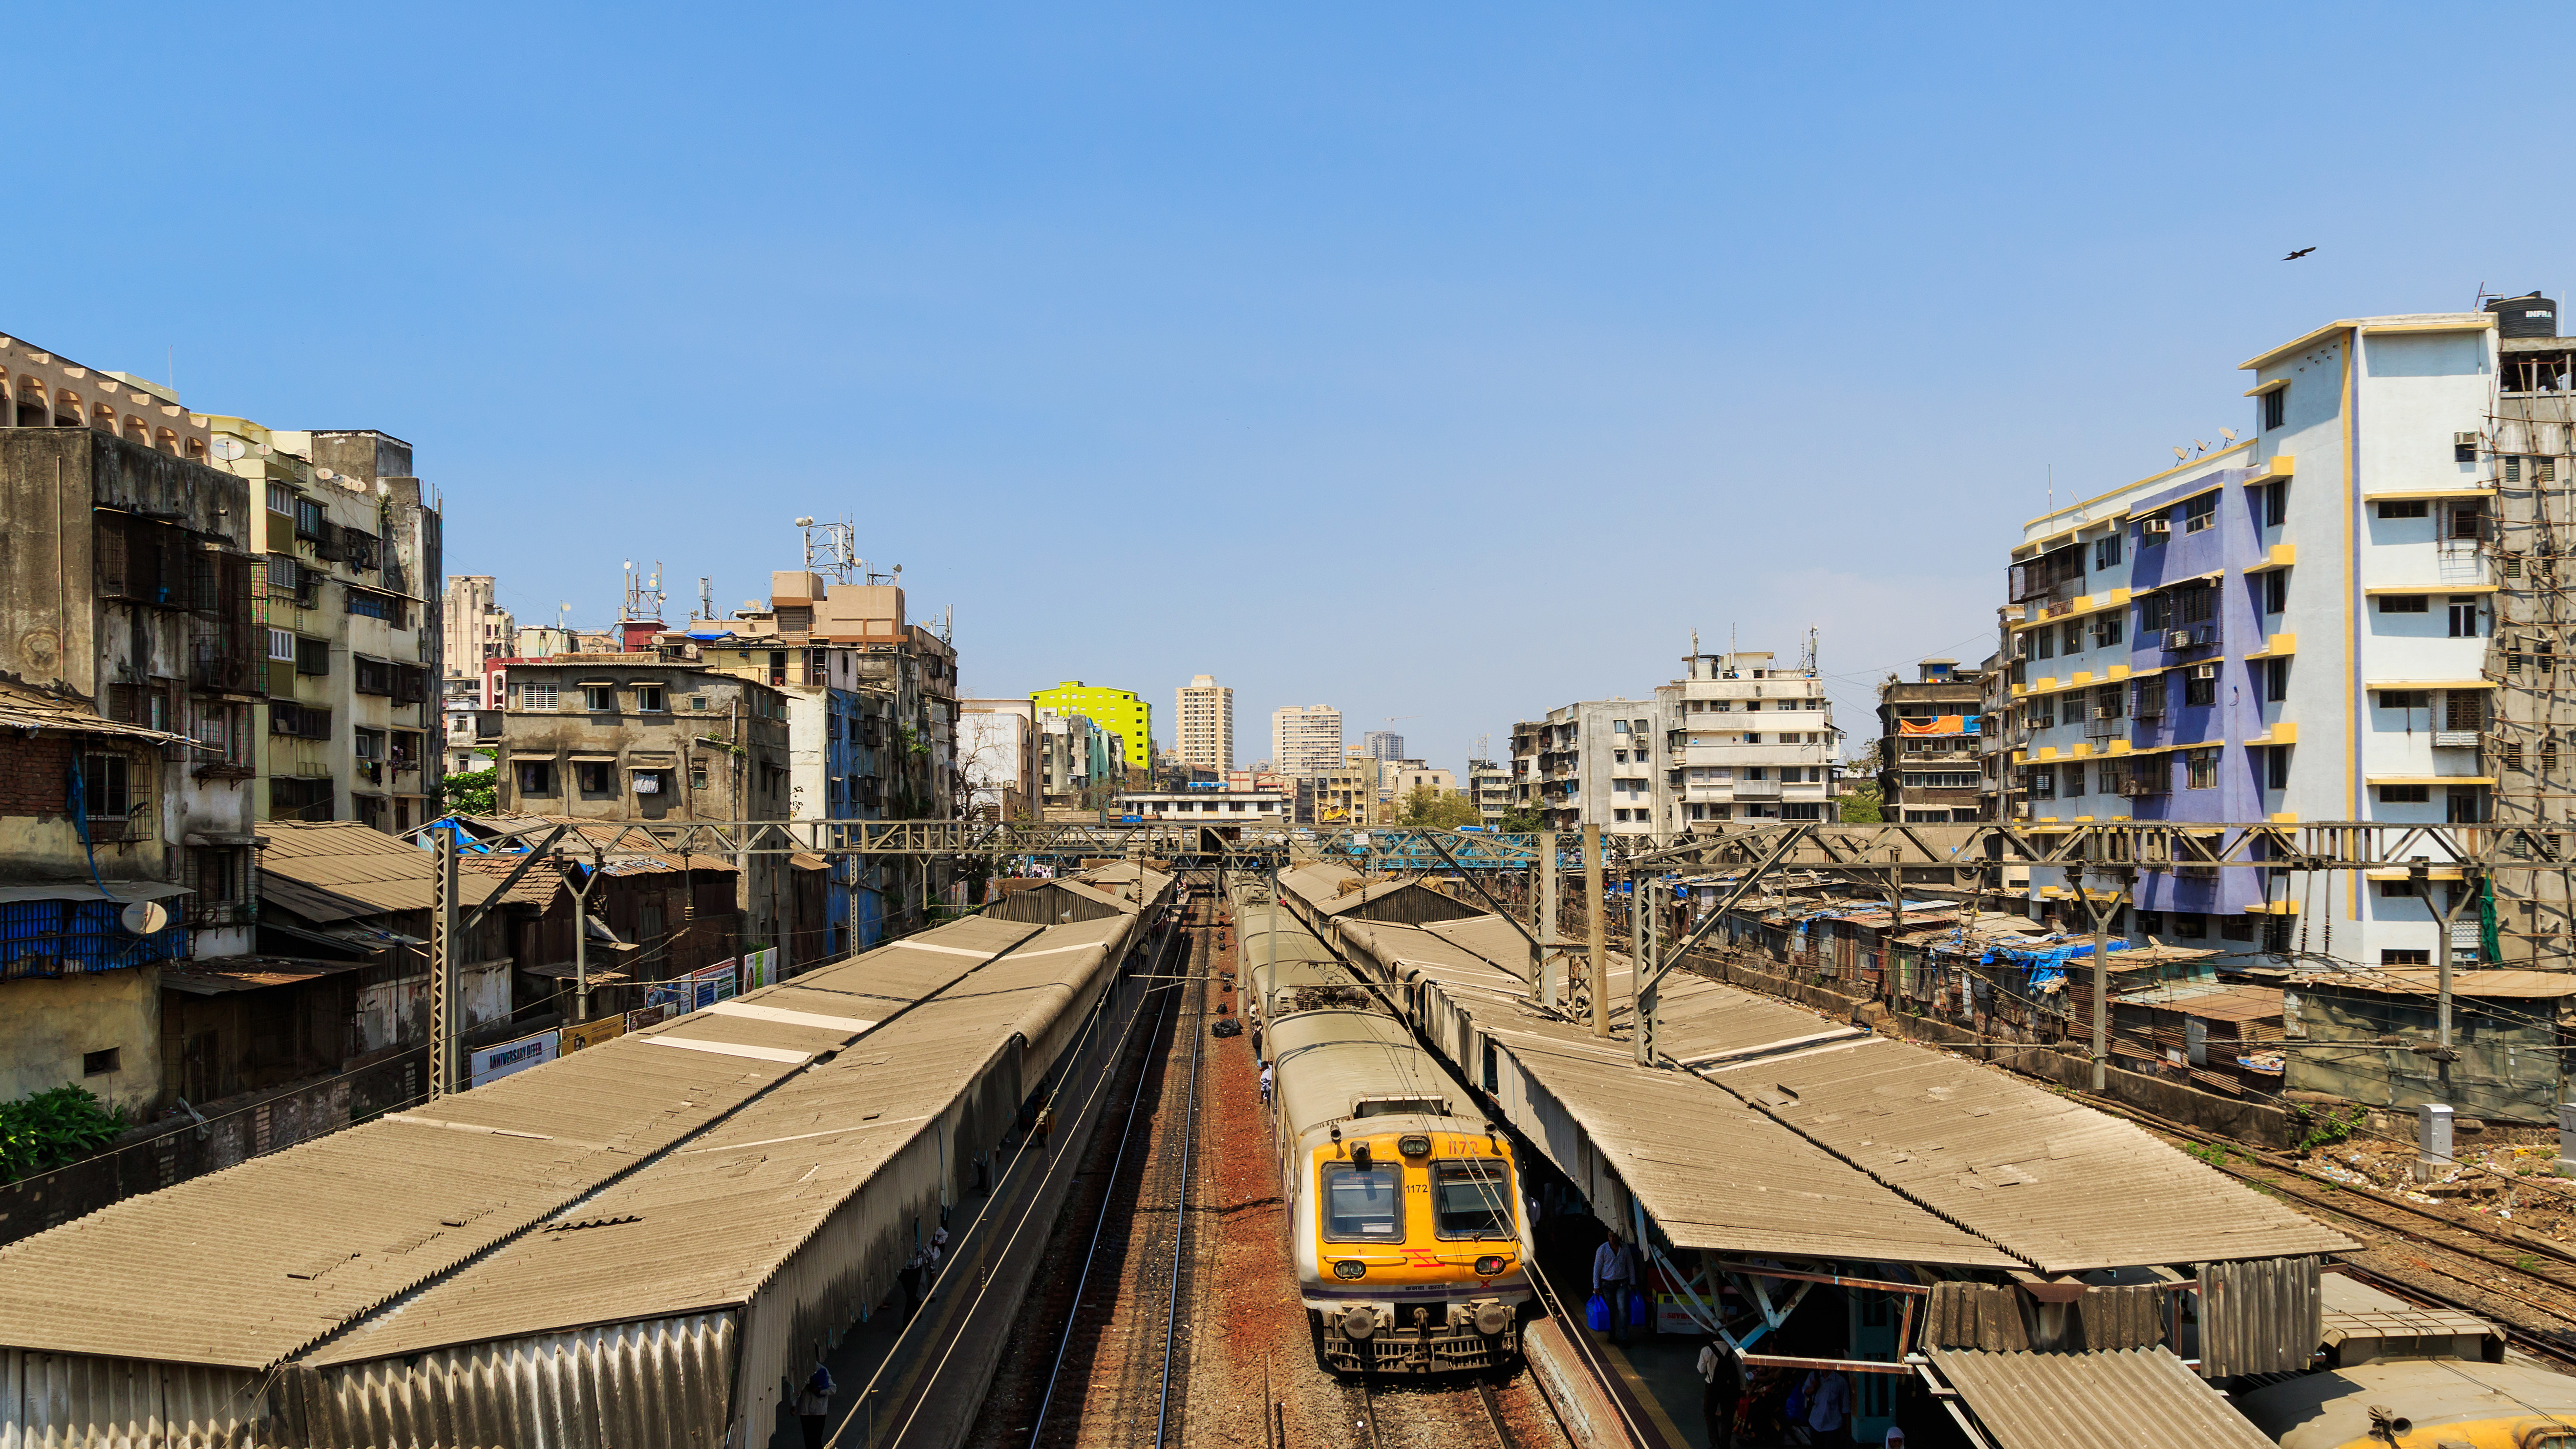 Masjid railway station - Wikipedia